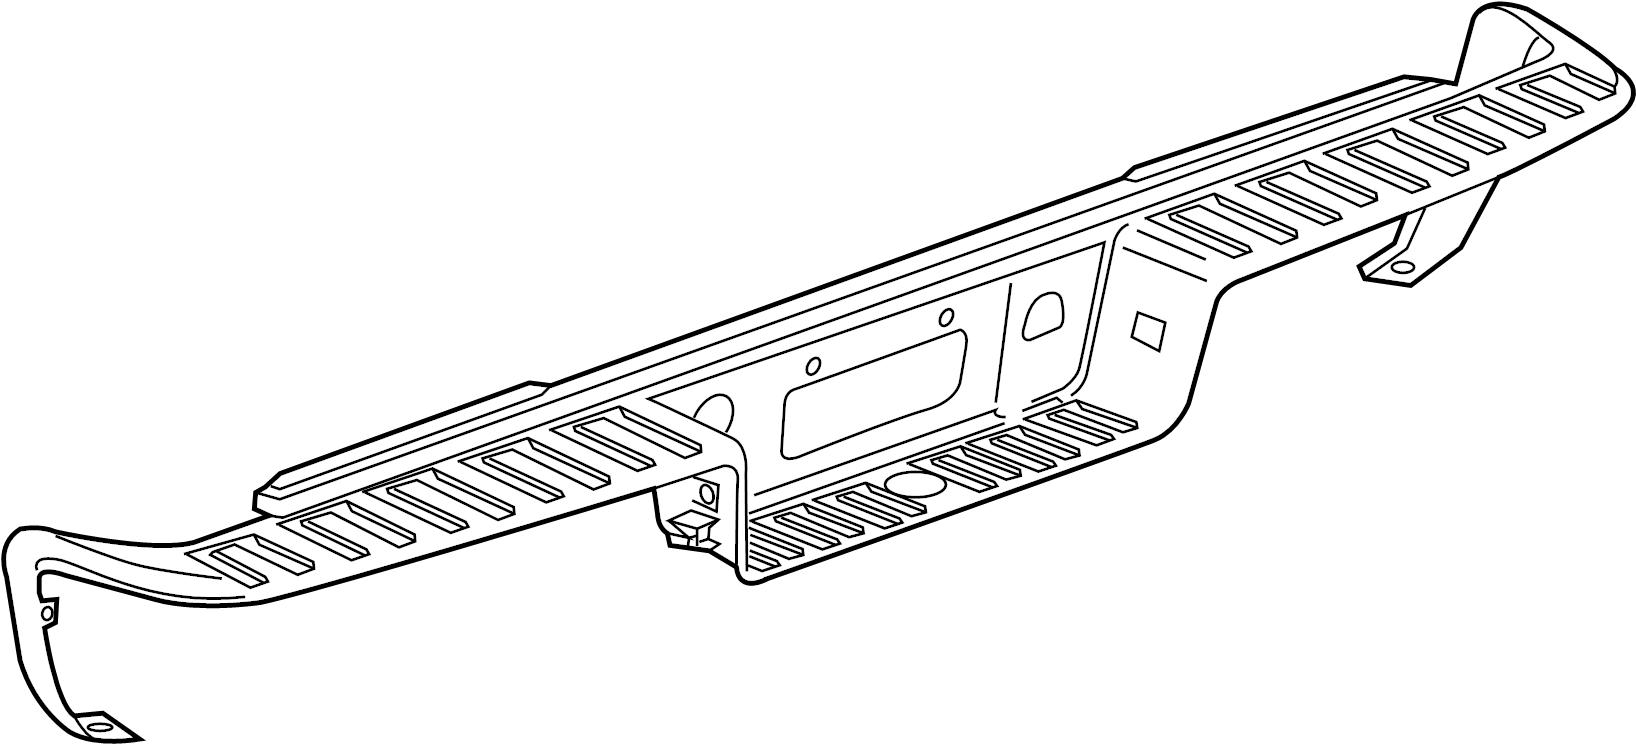 gmc sierra pad  rear bumper step  pad  rr bpr step anthracite